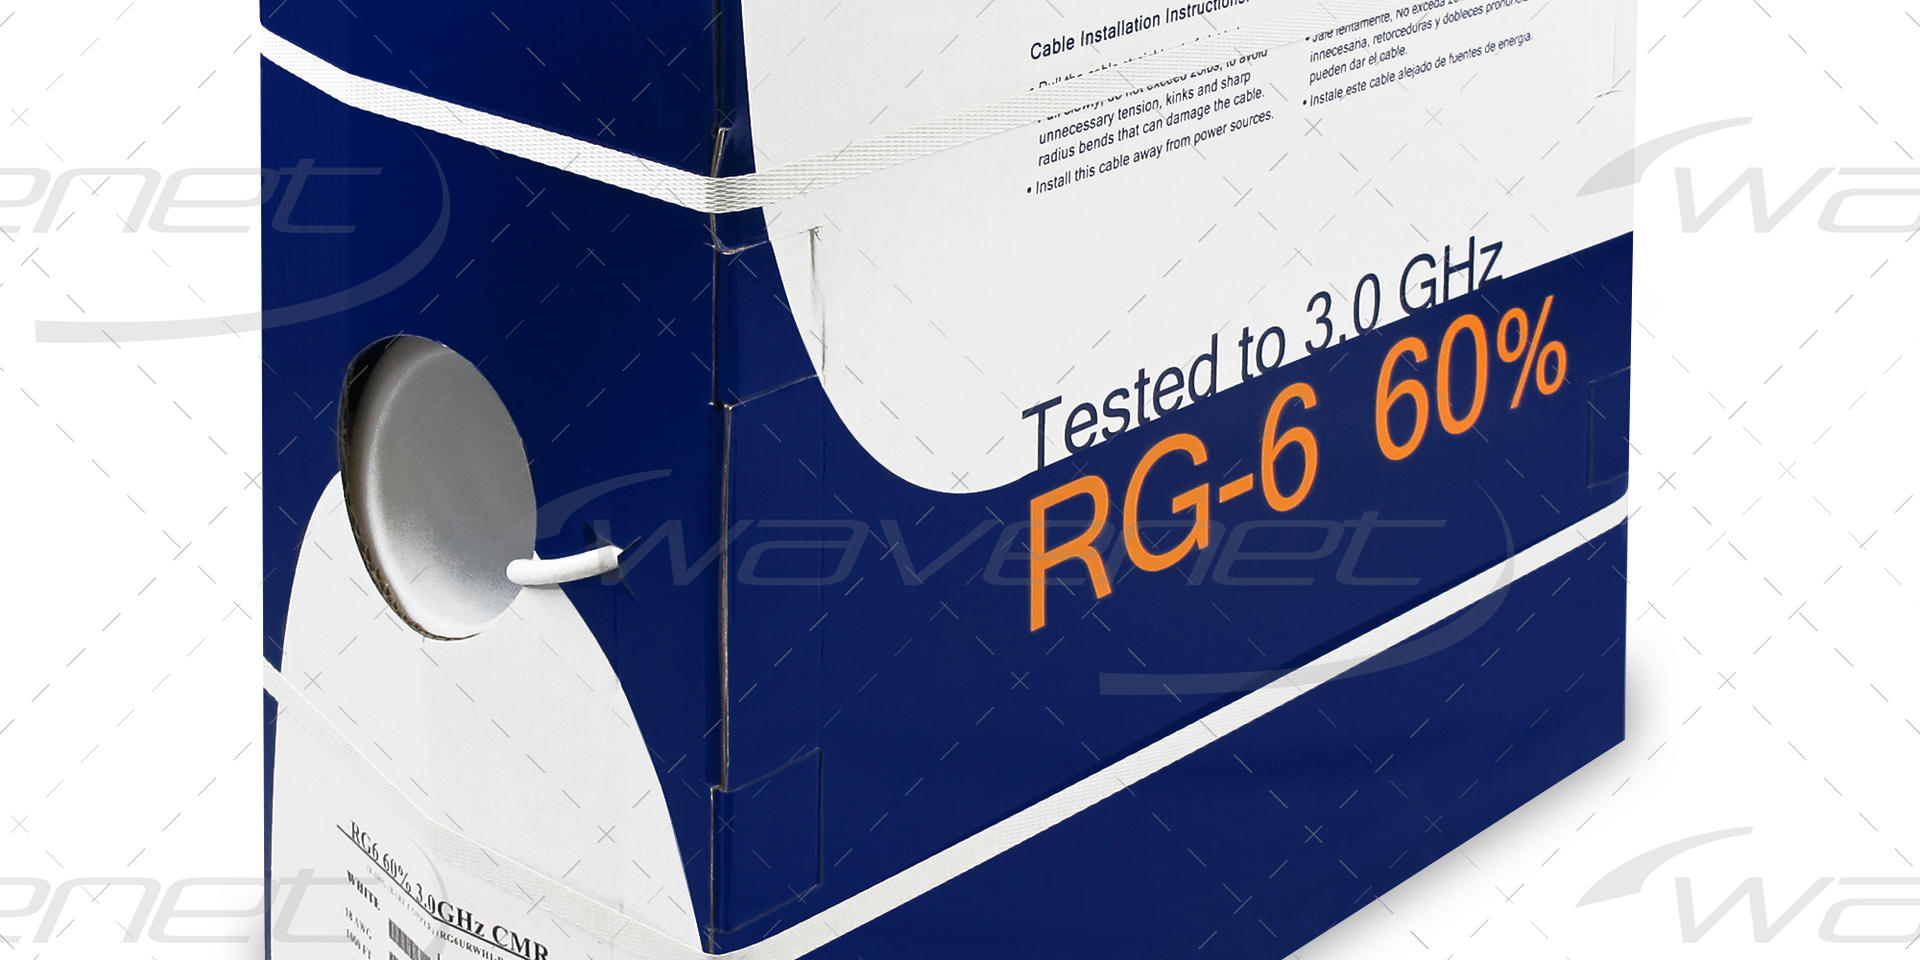 RG6URXX4-BC_WM.jpg